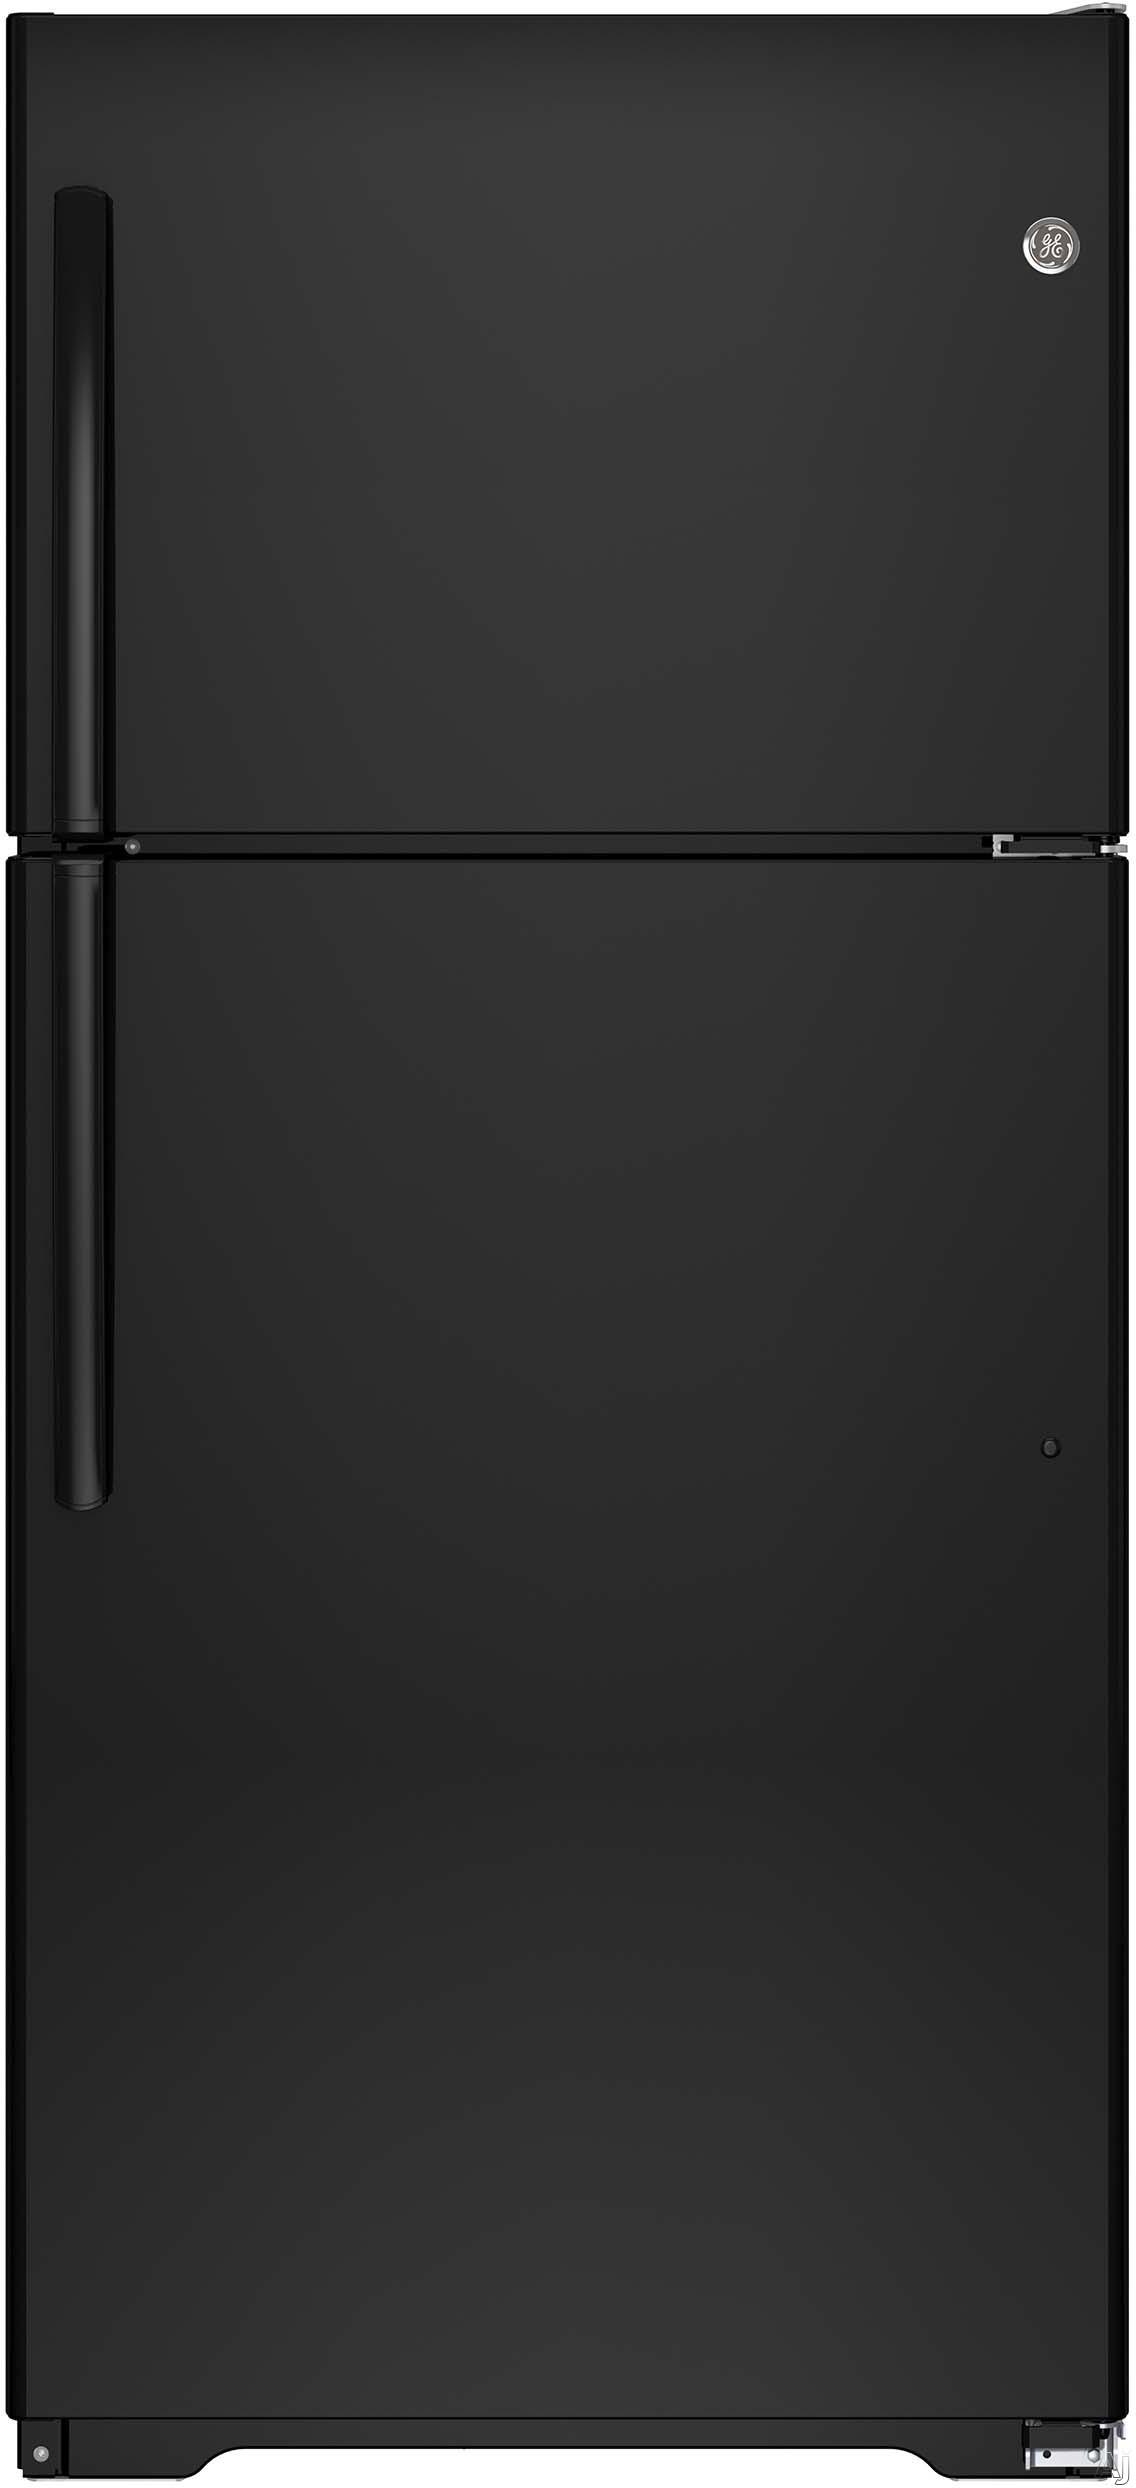 GE GTE18ITHBB 30 Inch Top-Freezer Refrigerator with Snack Drawer, Spillproof Freezer Floor, Optional Ice Maker, Adjustable Glass Shelving, Gallon Door Storage, ADA Compliant, ENERGY STAR® and 18.2 cu. ft. Capacity: Black